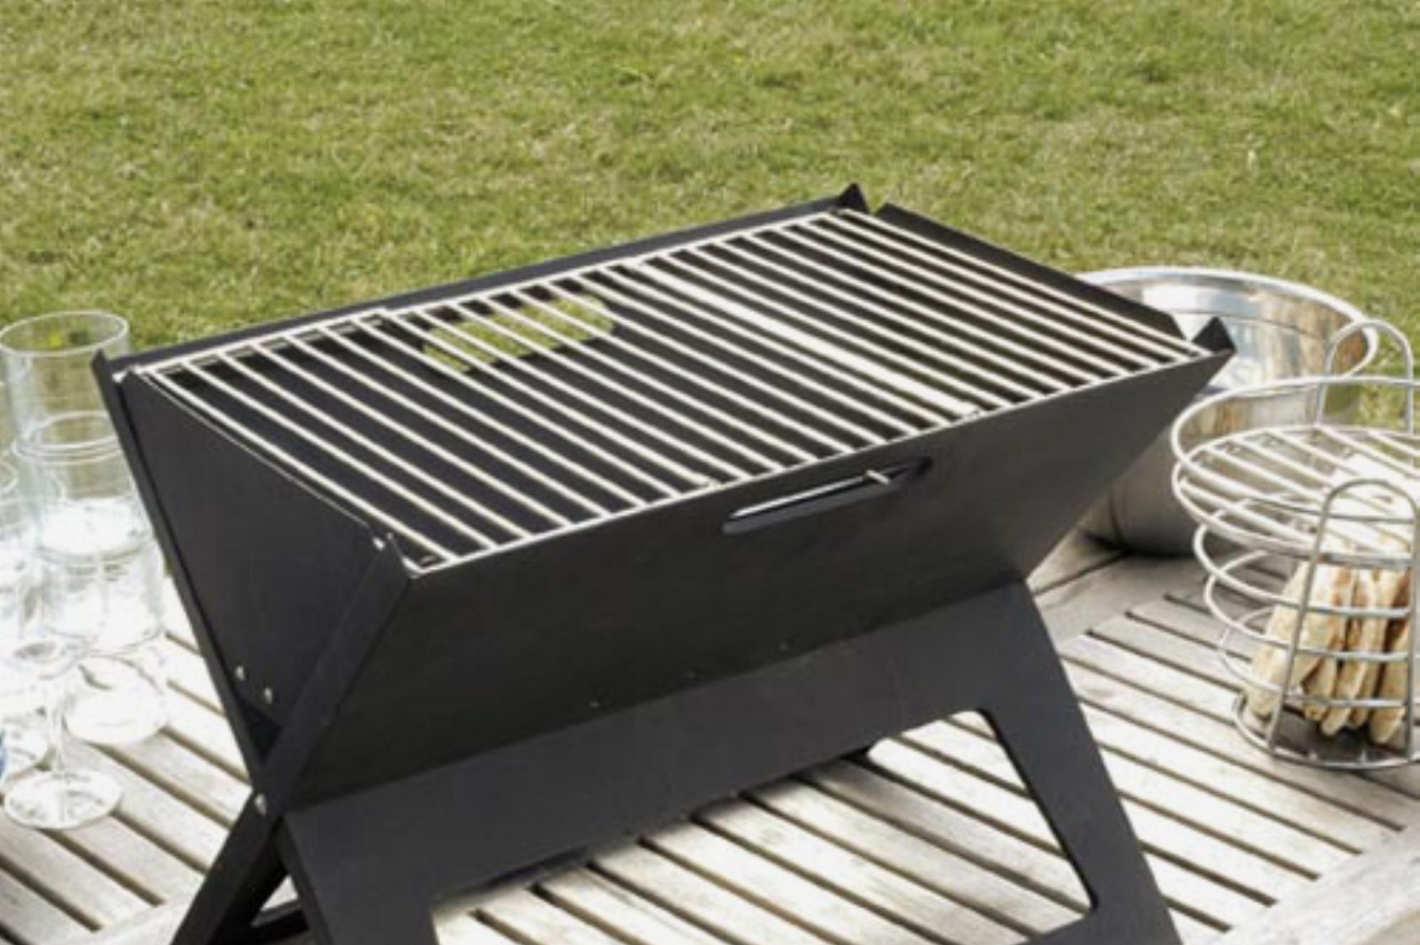 Fire Sense Foldable Portable Grill